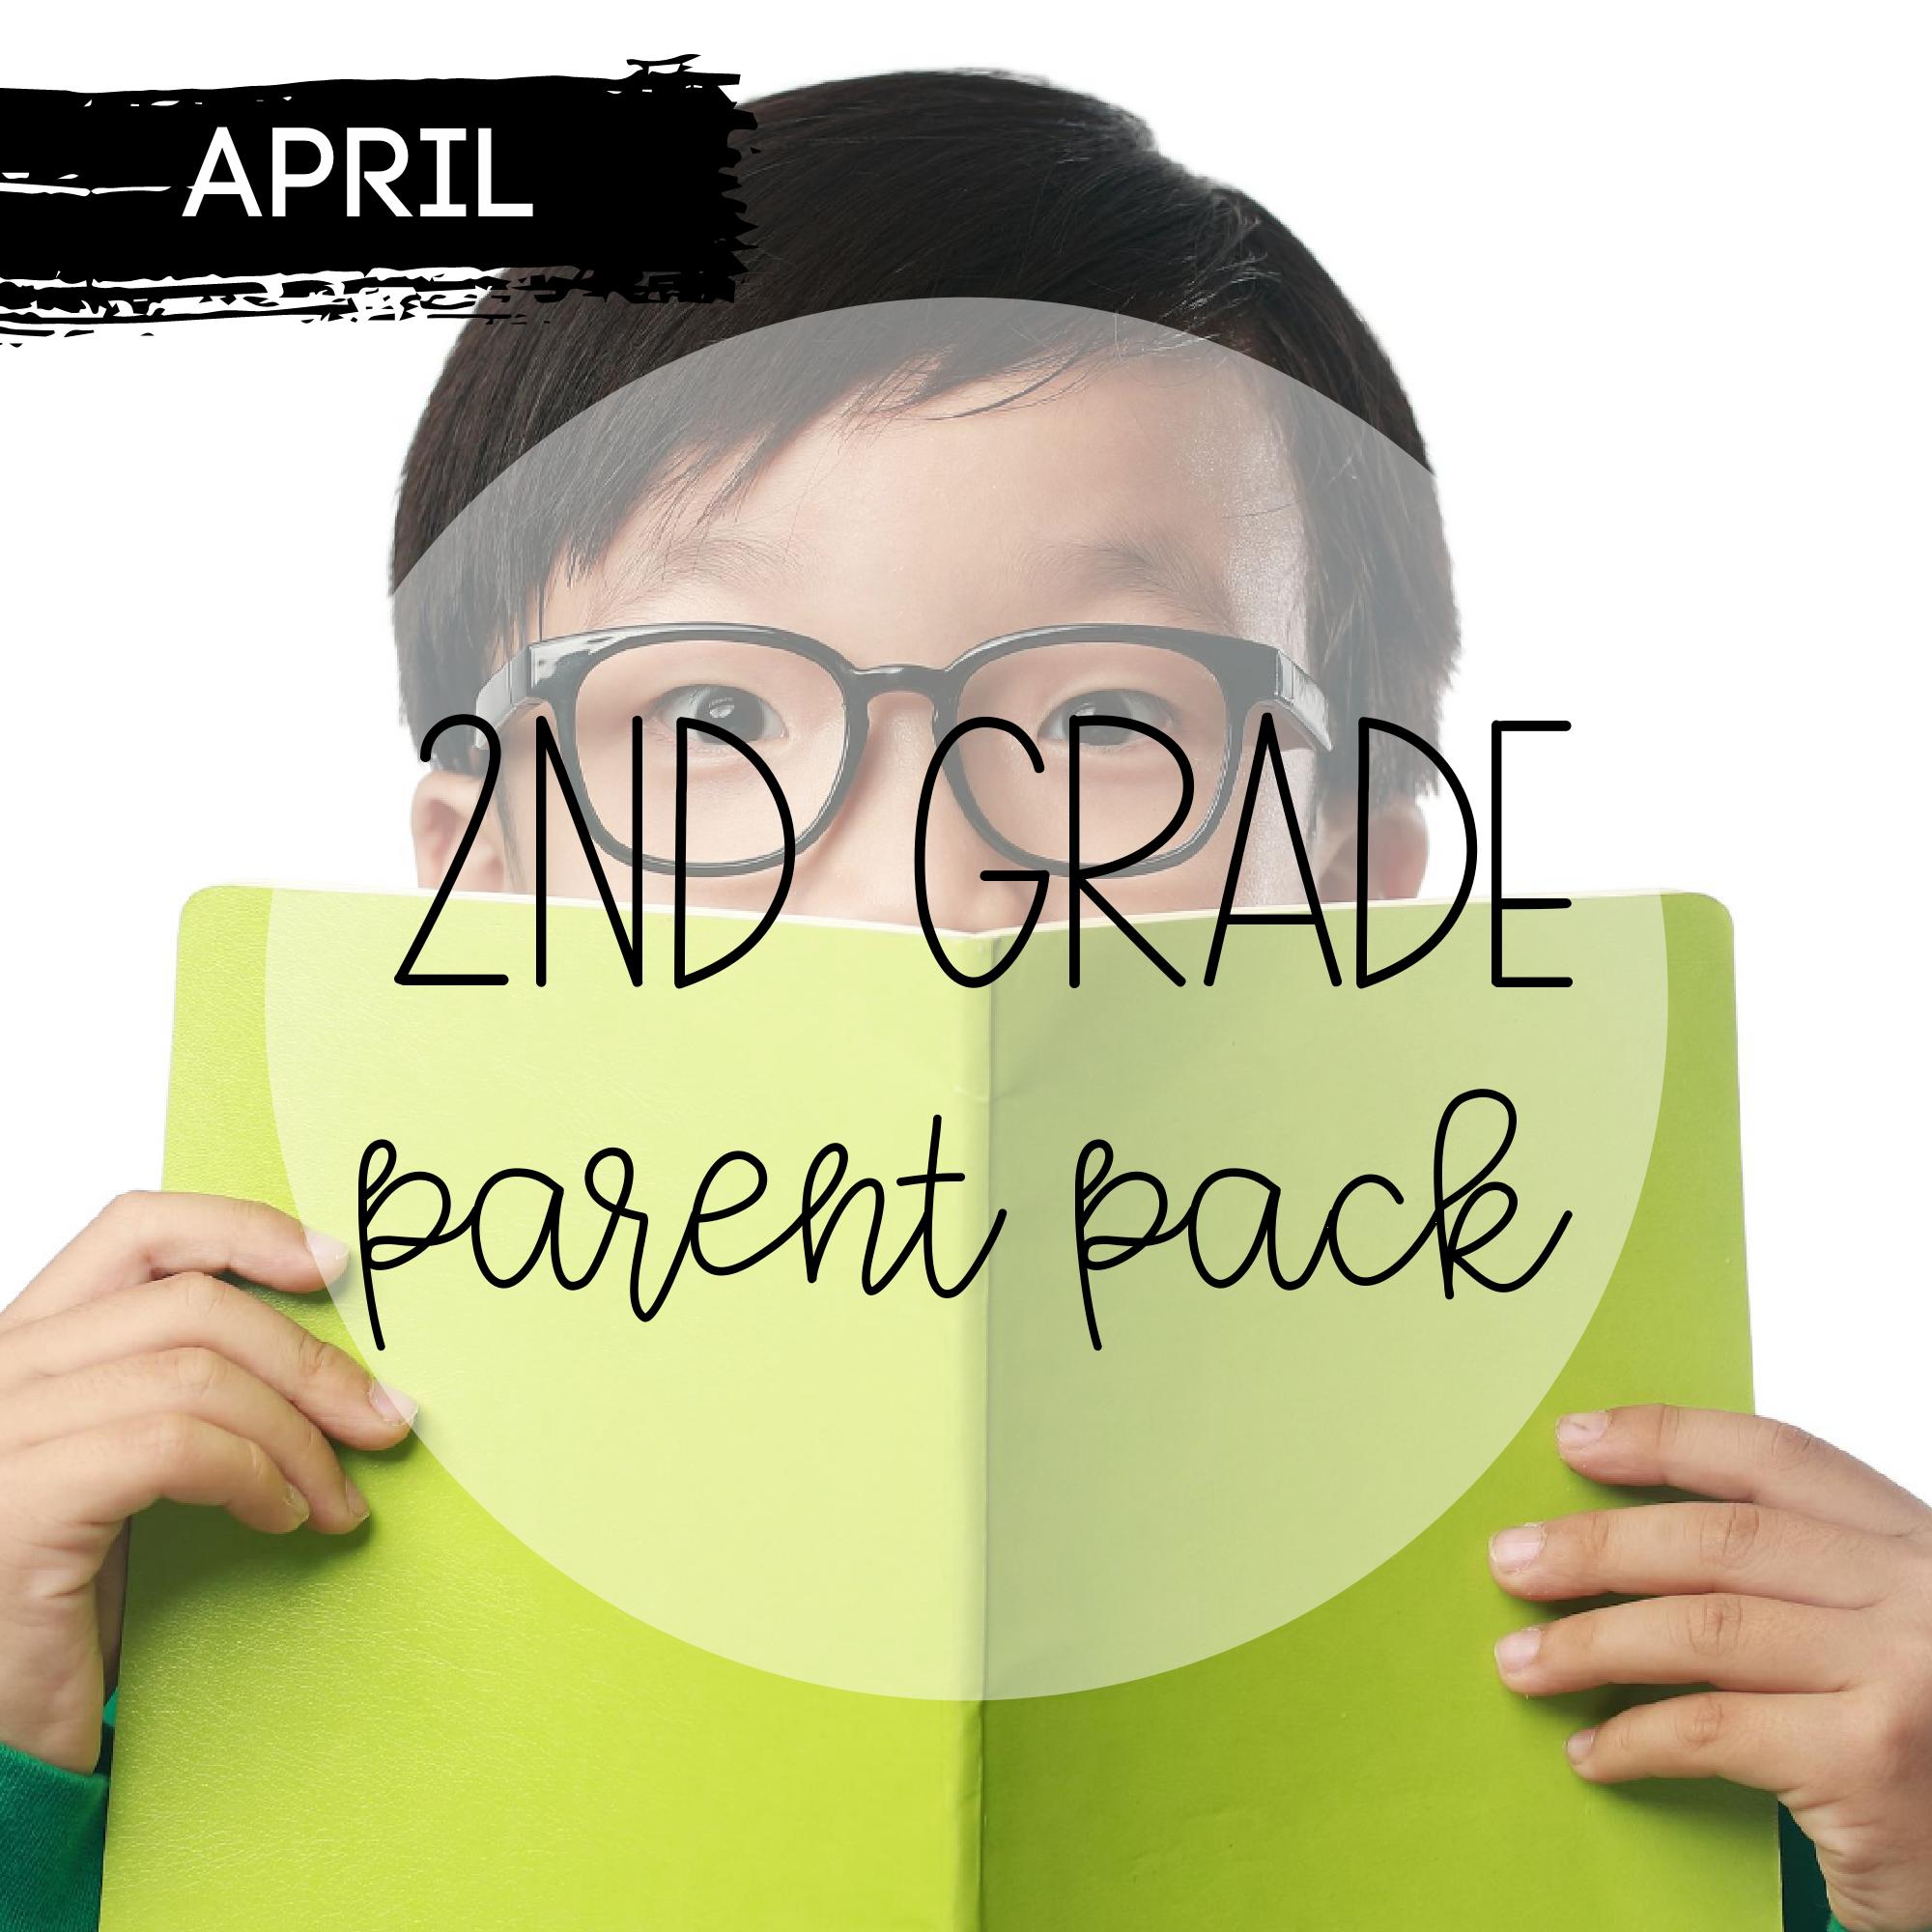 April Second Grade Pack